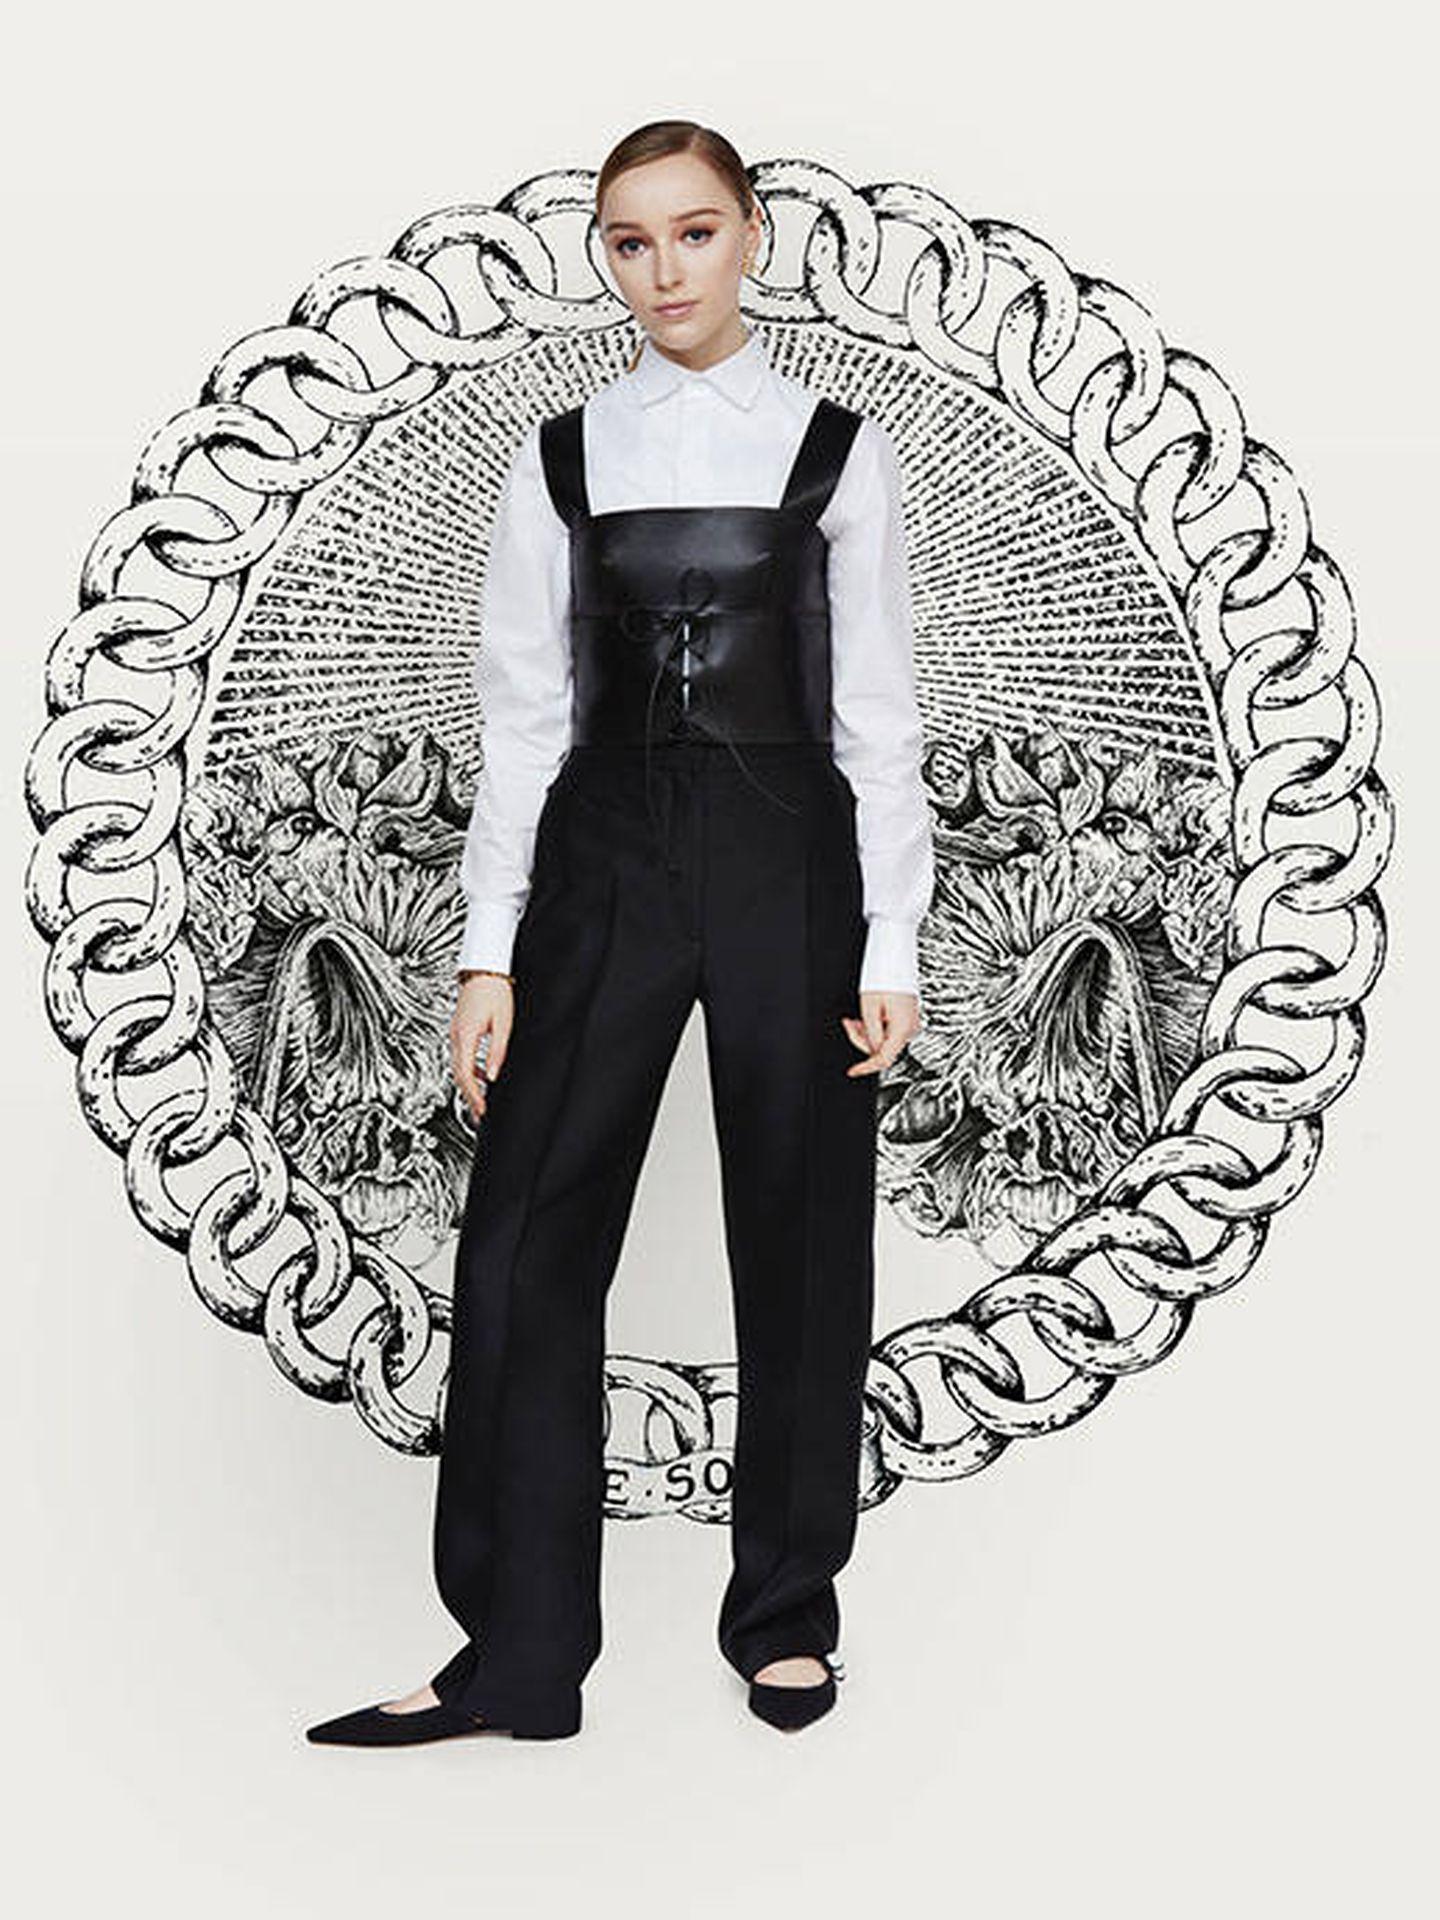 Phoebe Deynvor. (Dior)